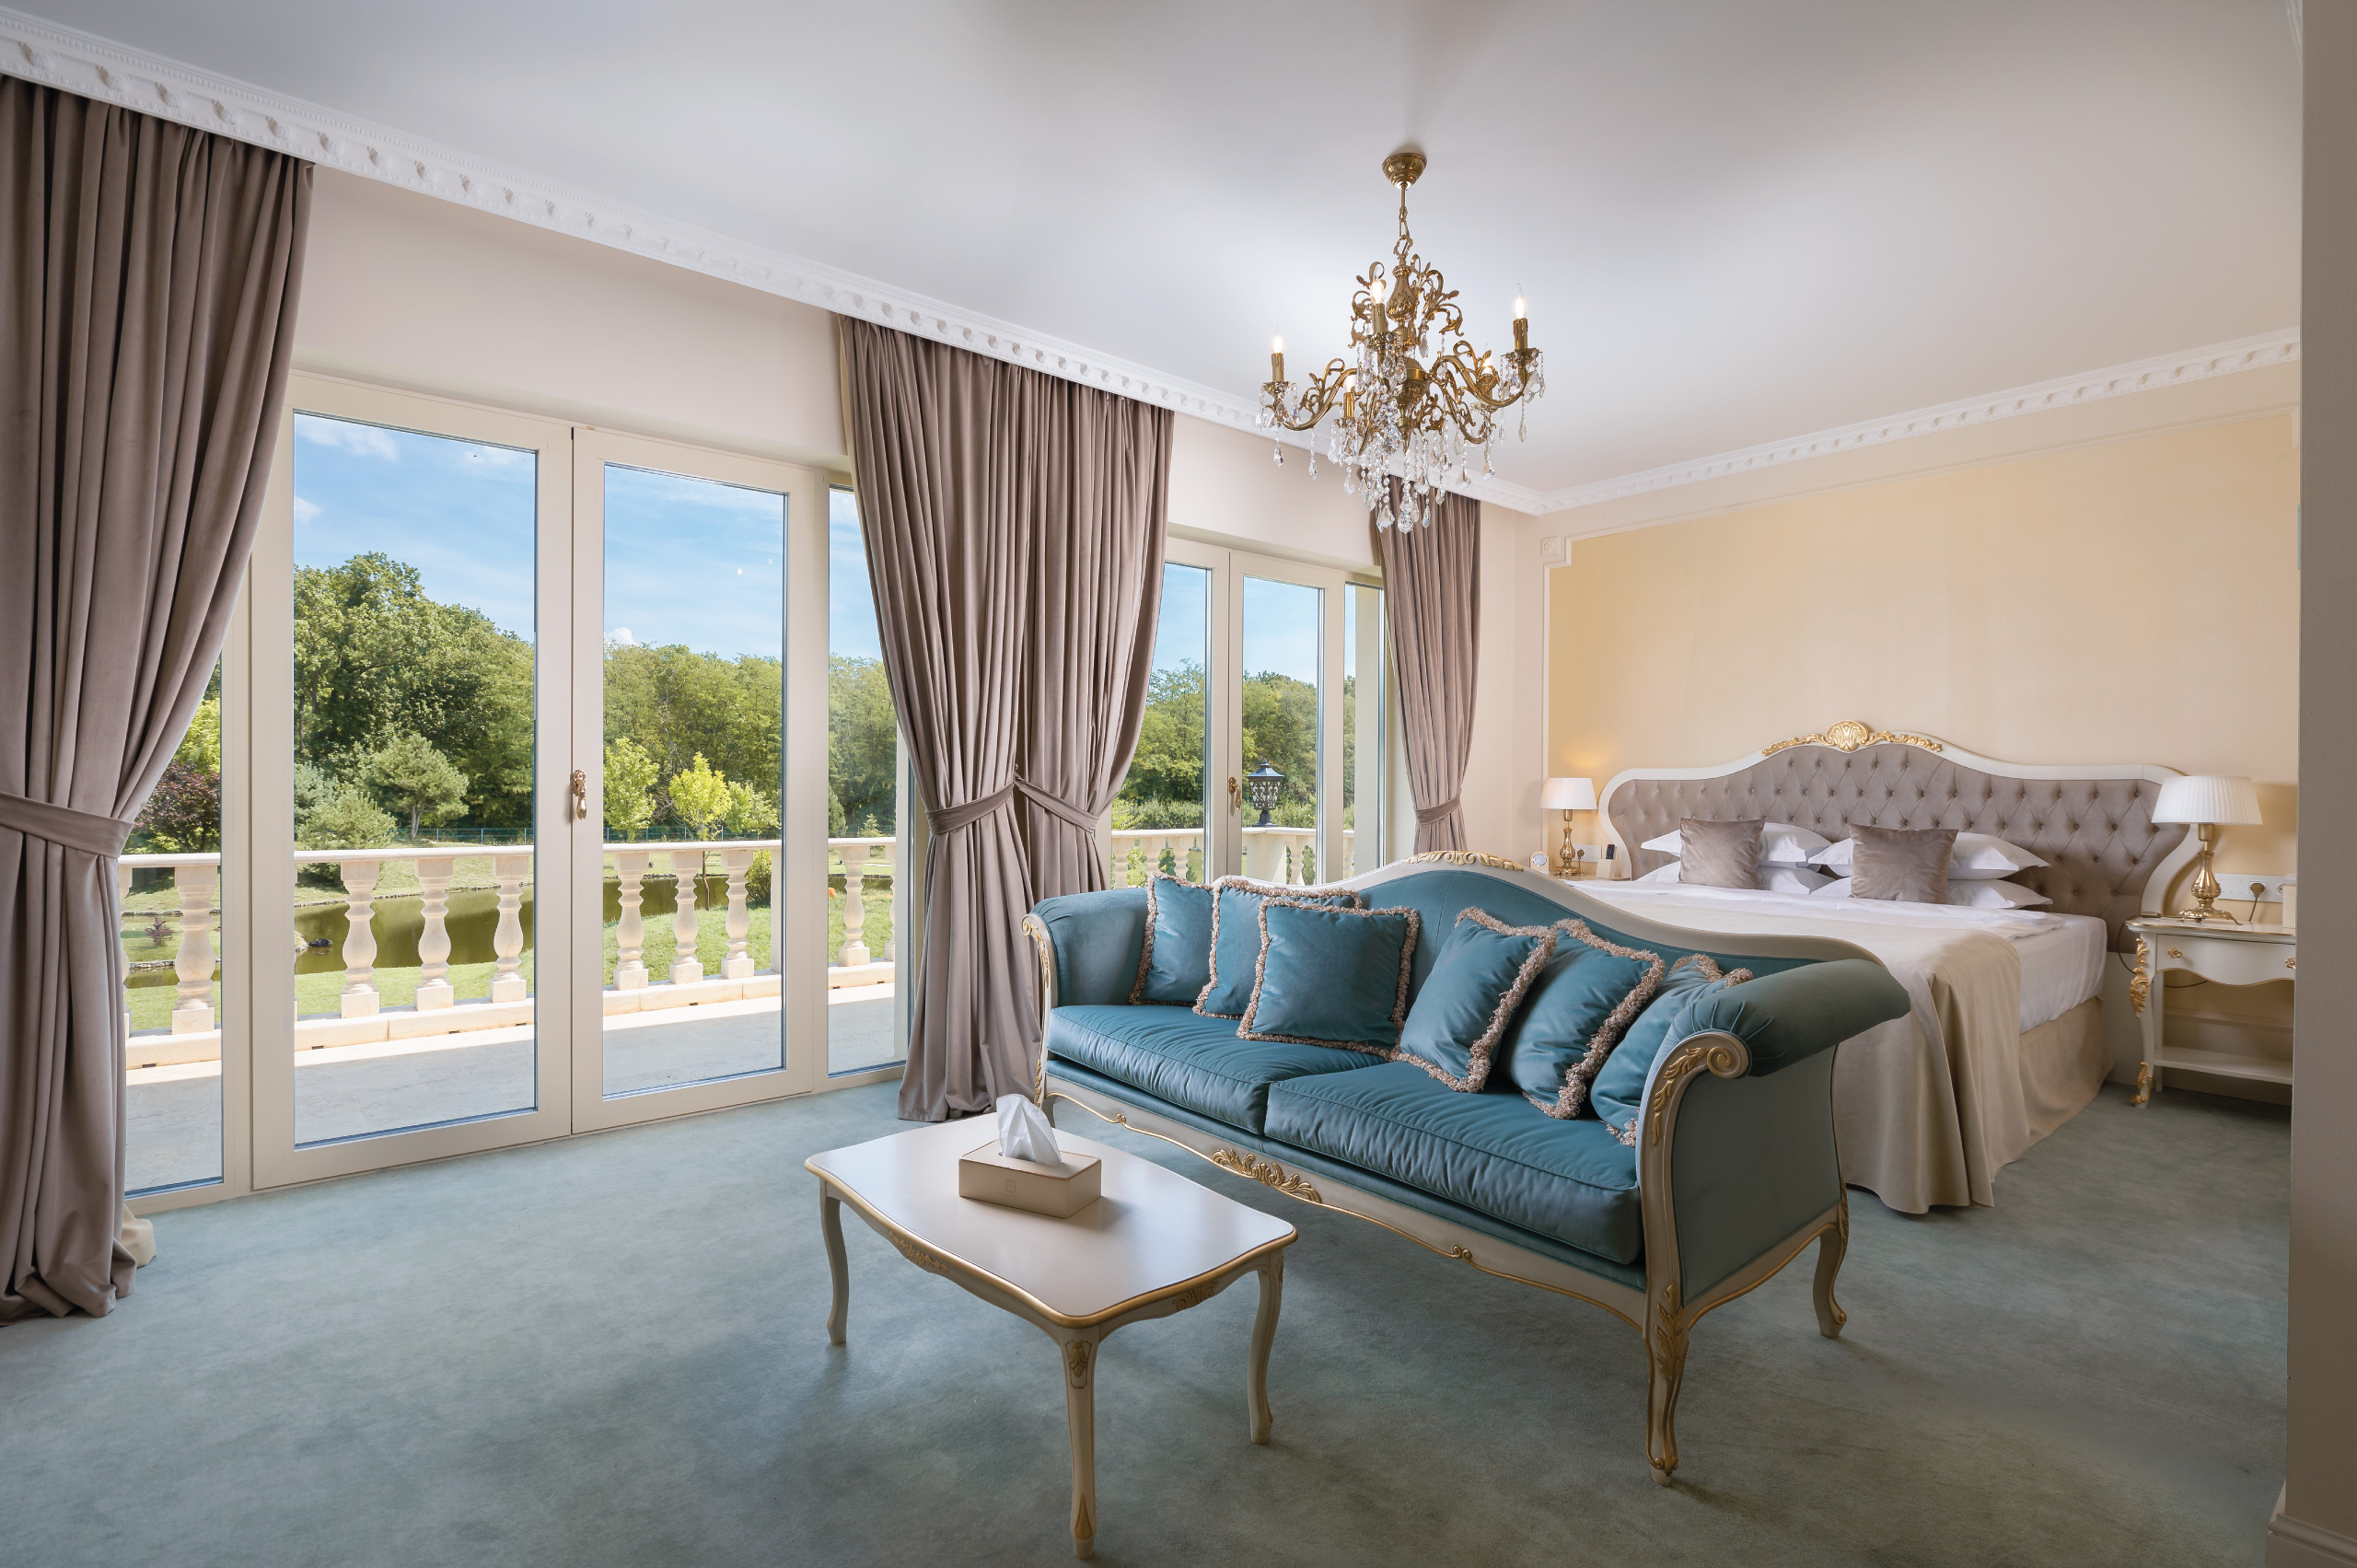 villa-trevi-executive-suite-vedere-gradina-hotel-timisoara